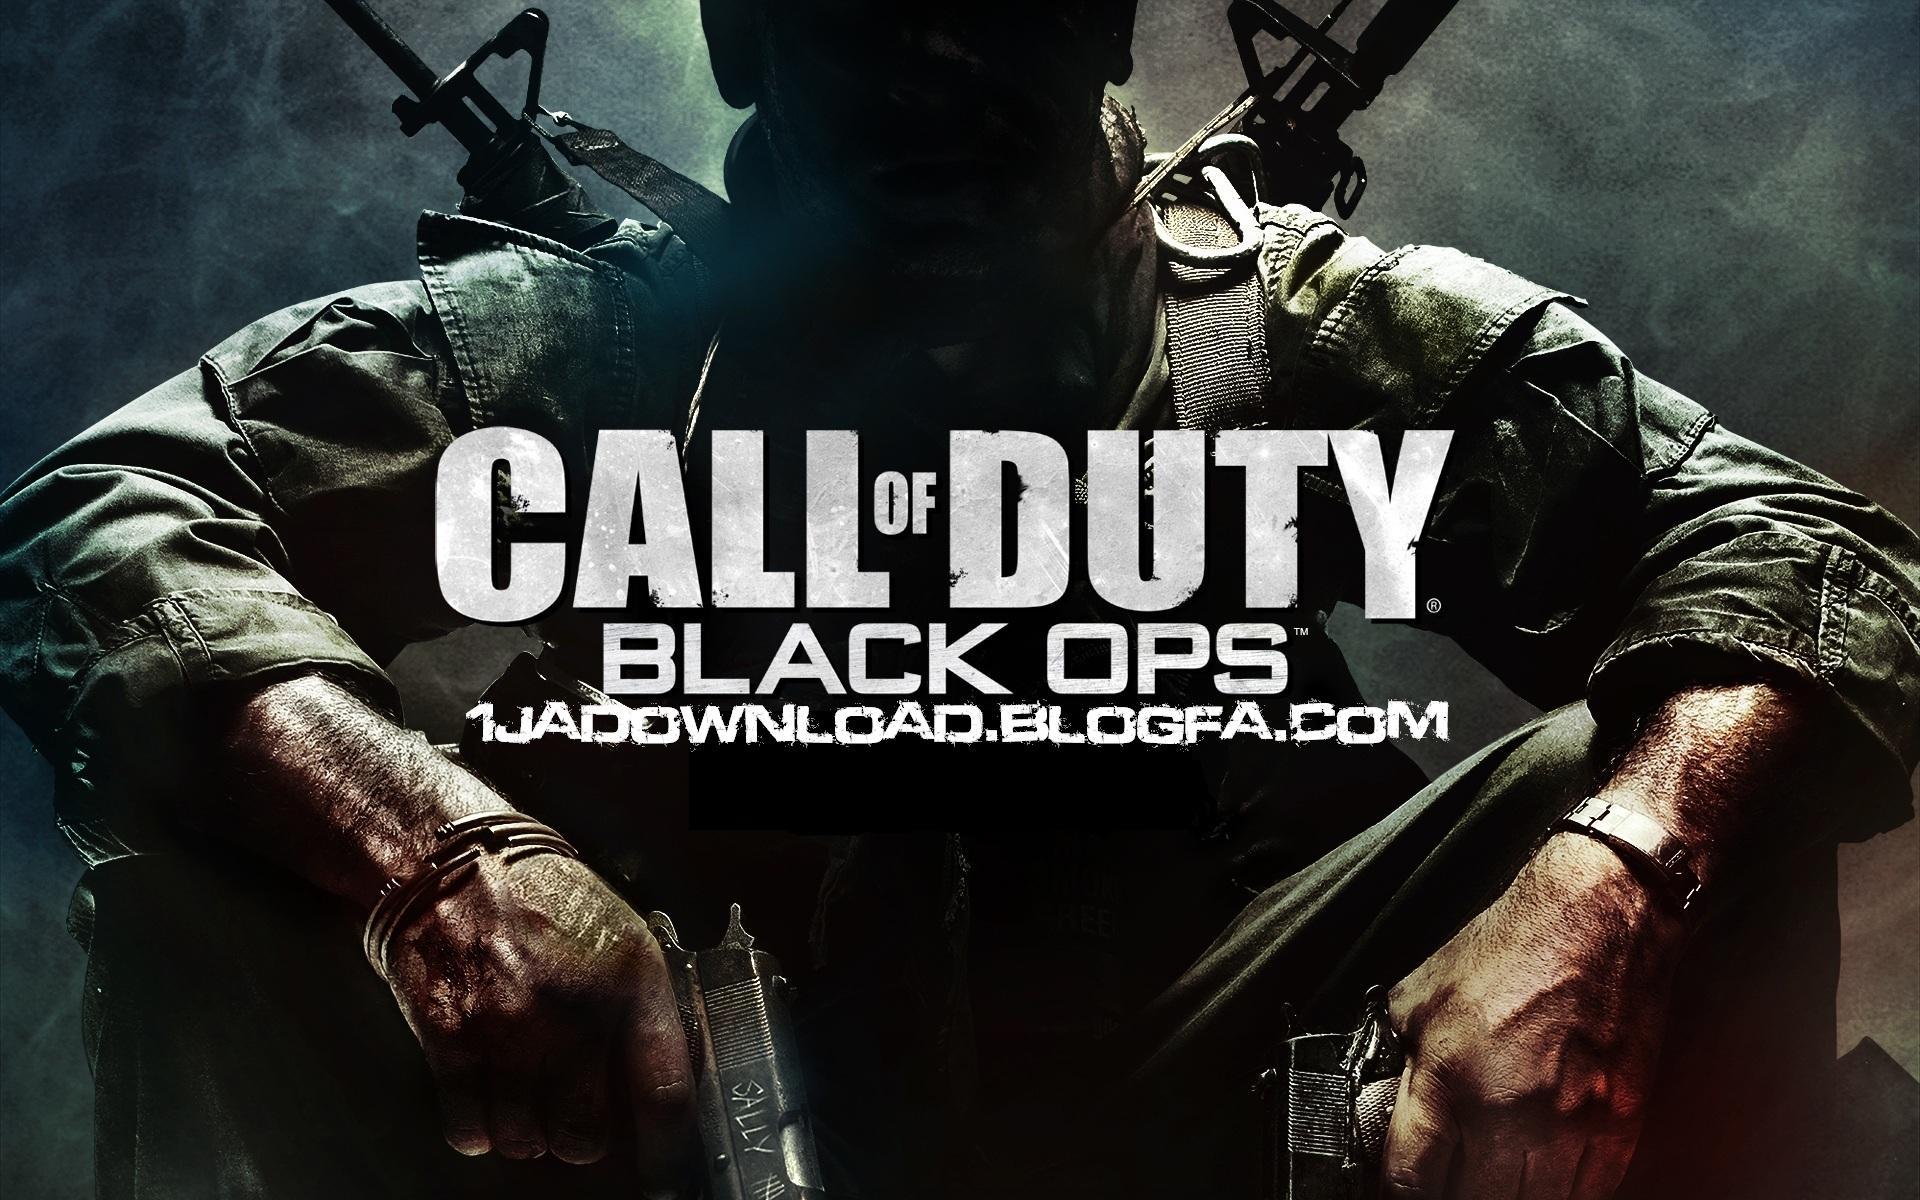 http://yekjadownload.persiangig.com/image/2843.COD-BLACK-Ops.jpg